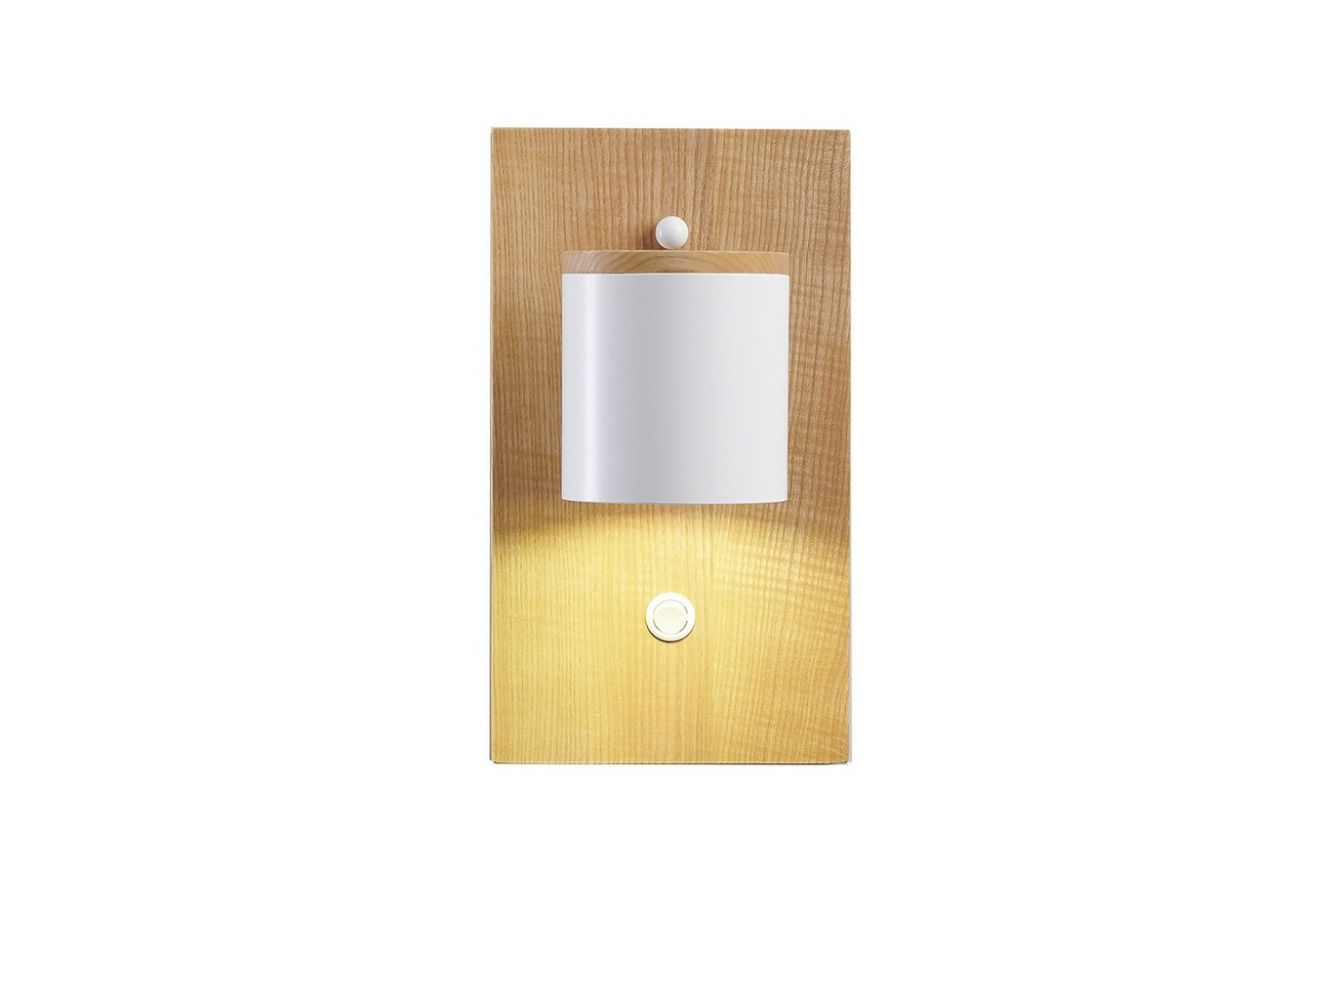 Ecolight Deco 003965